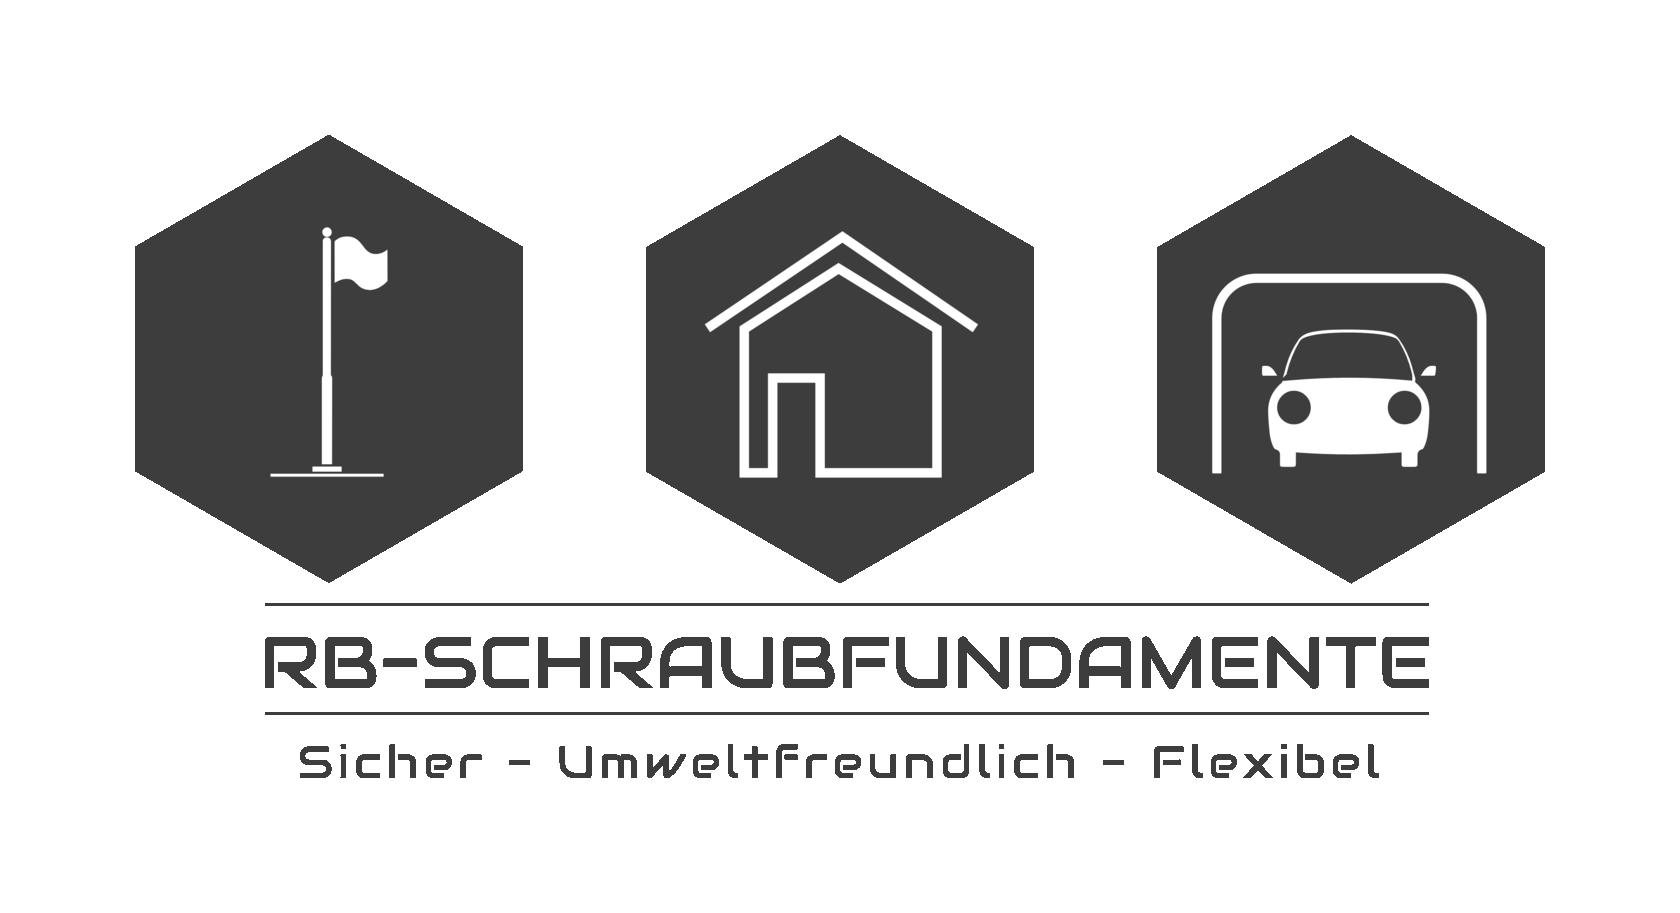 RB Schraubfundamente Roman Benzler